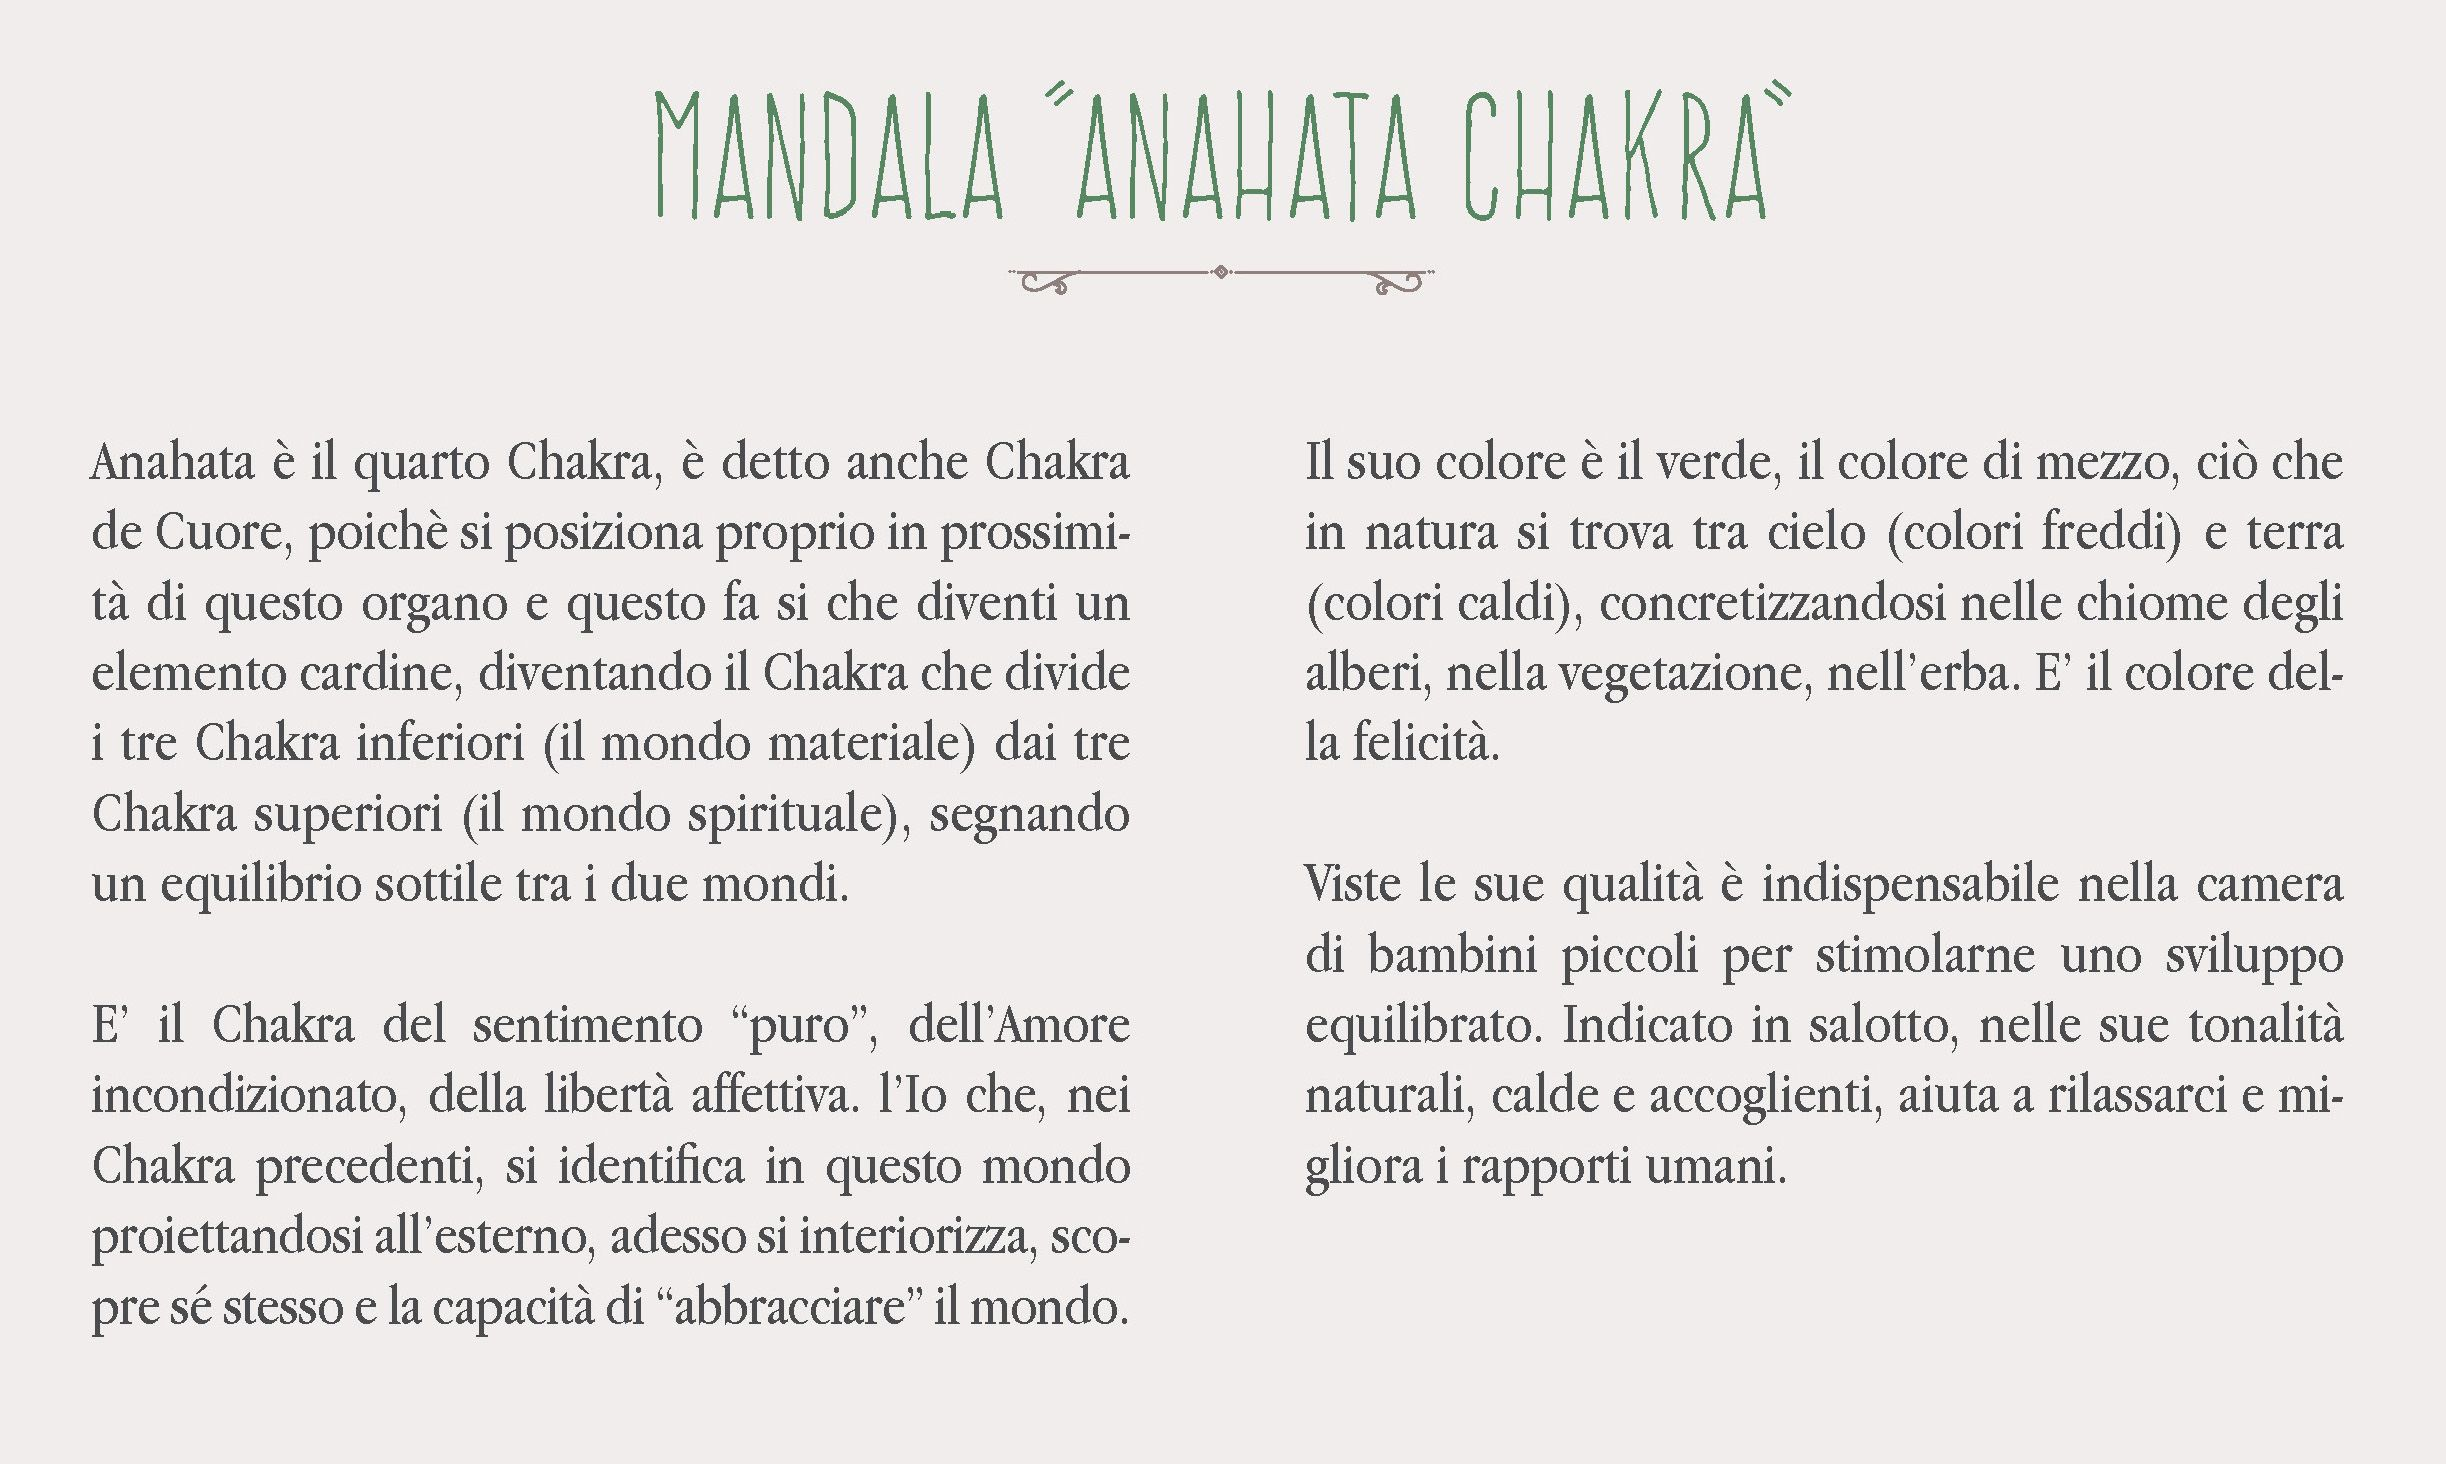 Mandala Anahata Chakra Le Superfici Dellarmonia Giada Mete Per